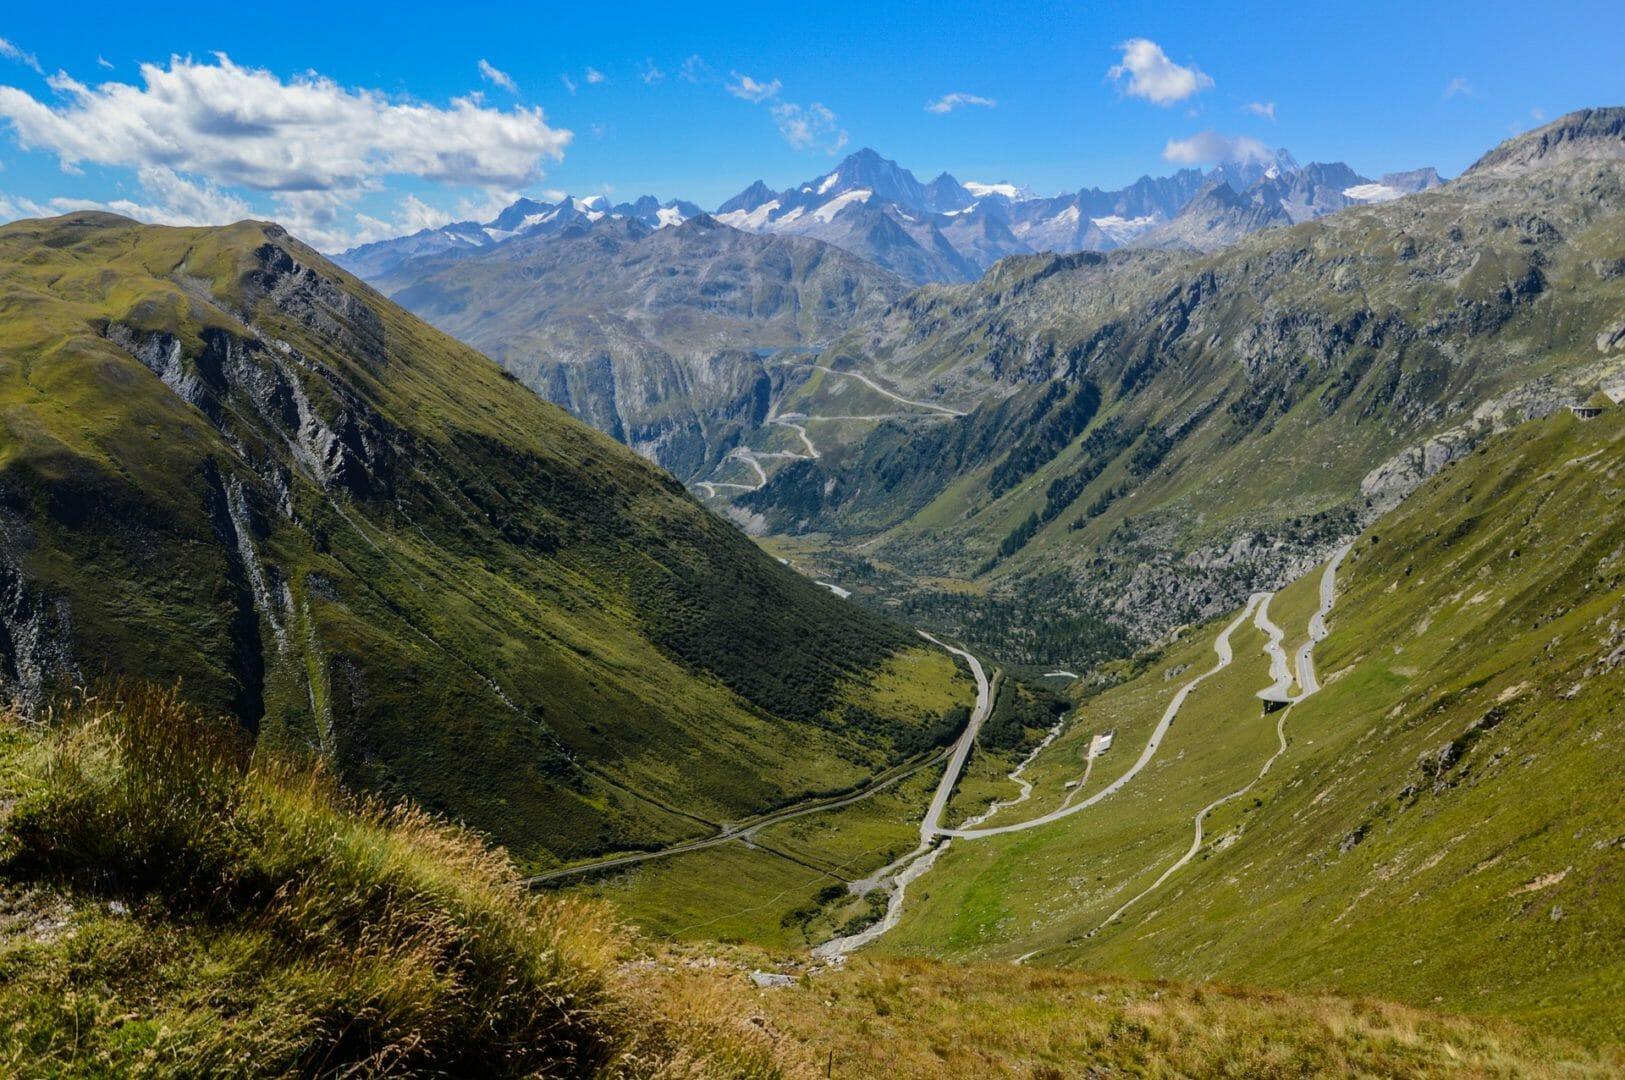 Route du Saint-Gothard